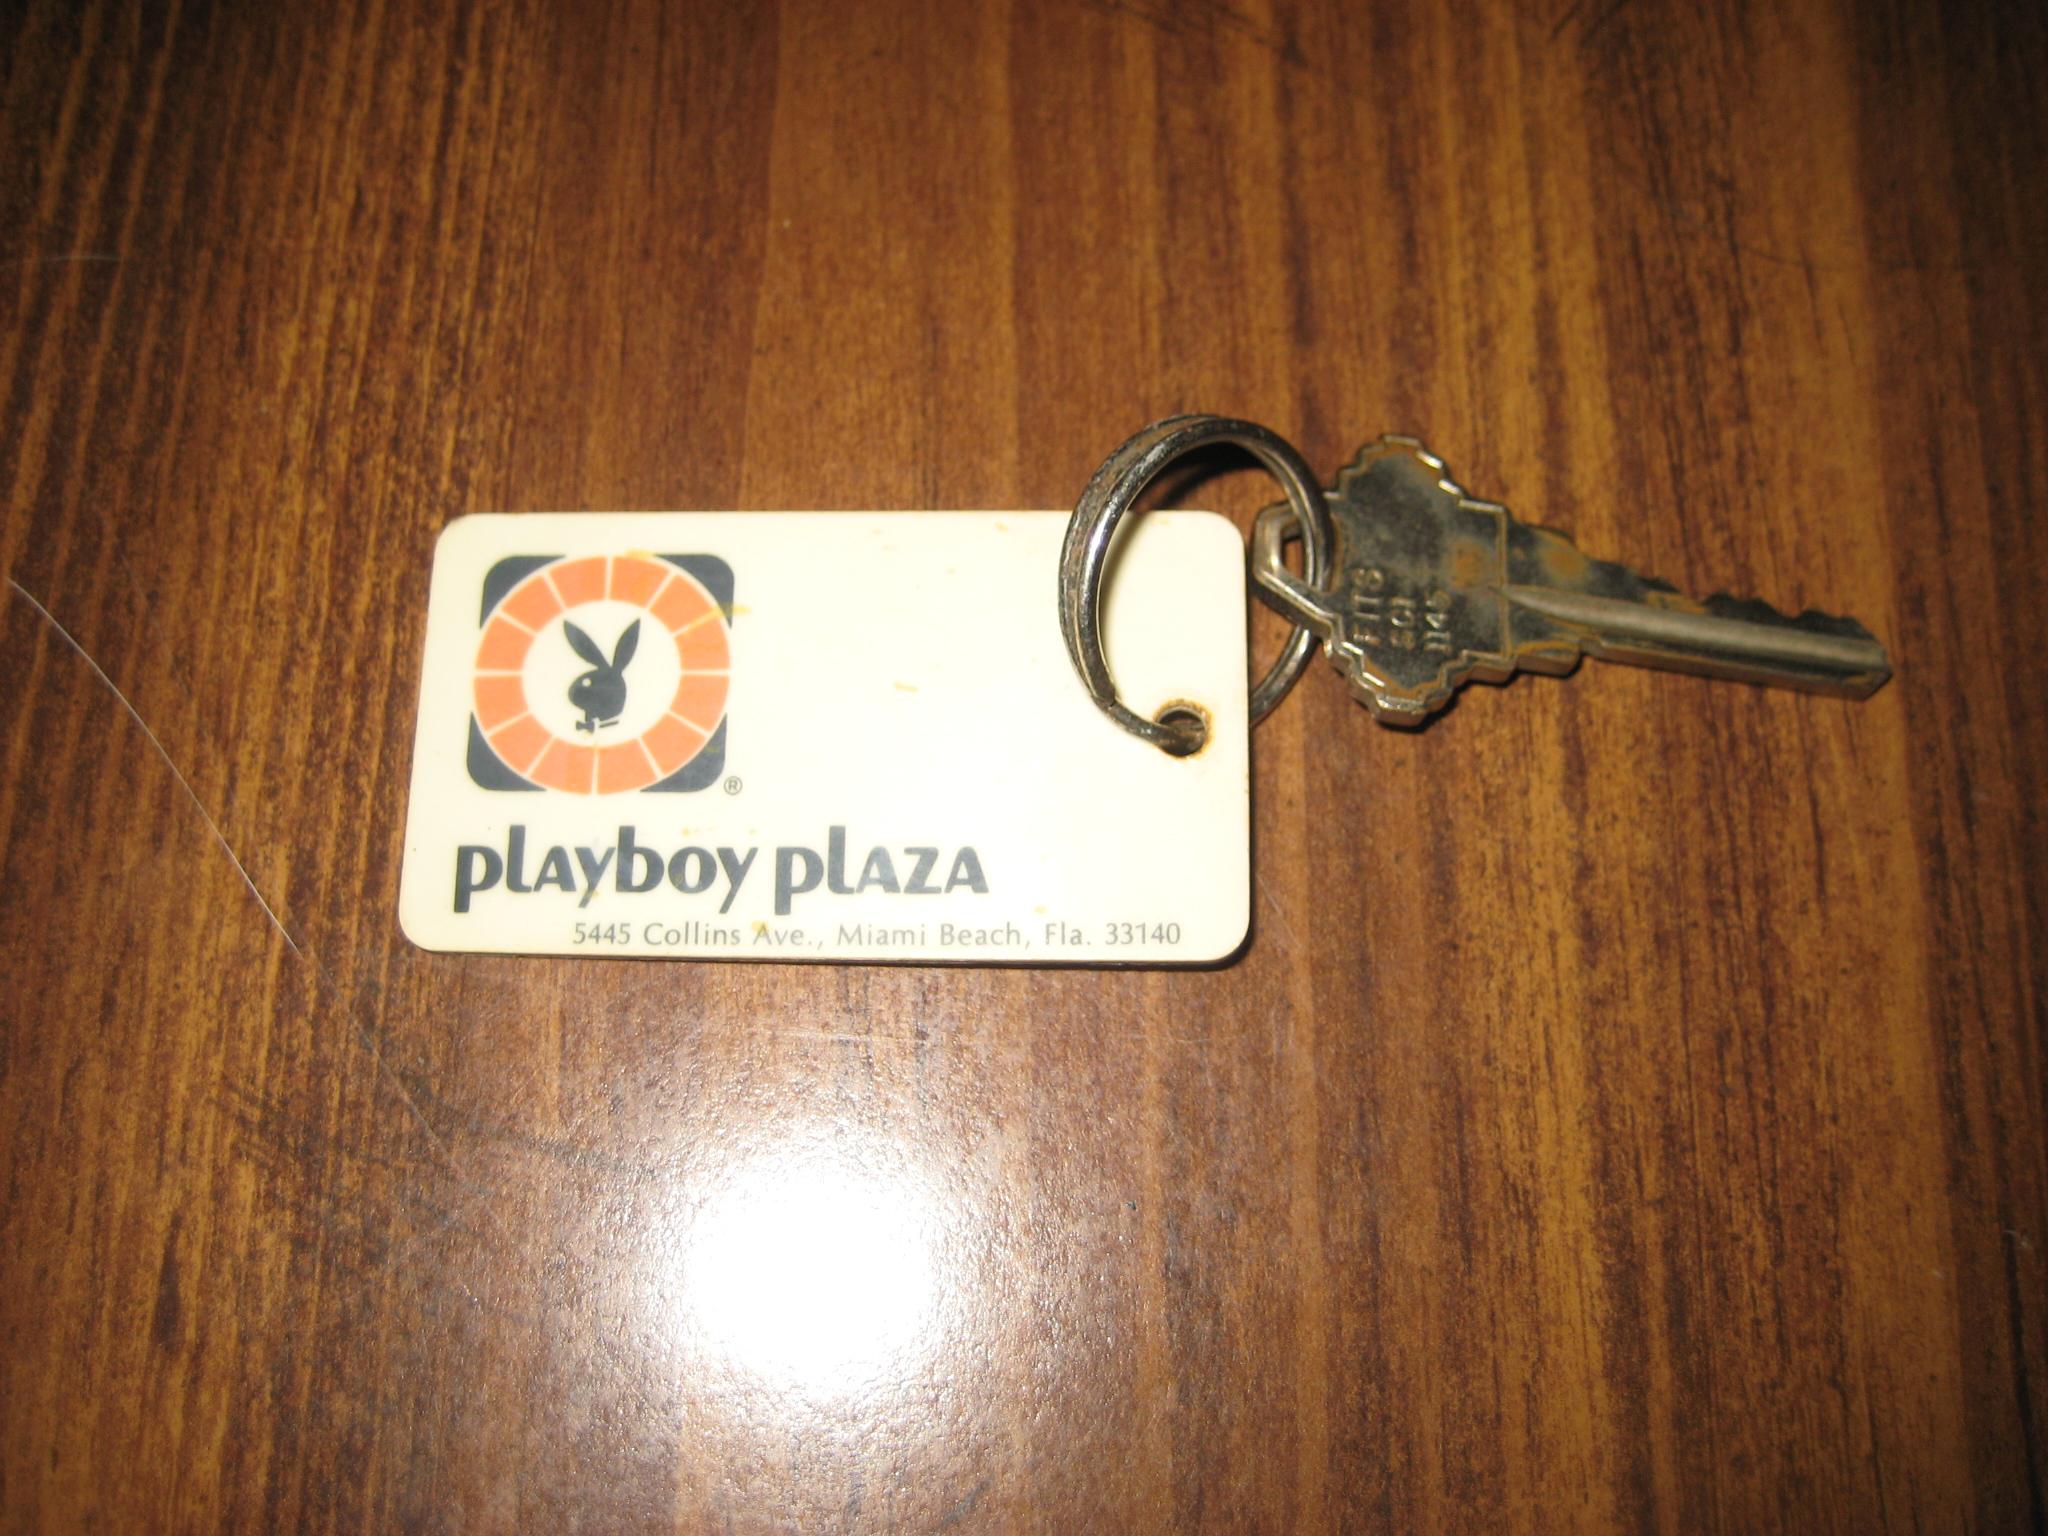 Playboy Plaza Miami Beach Room Key